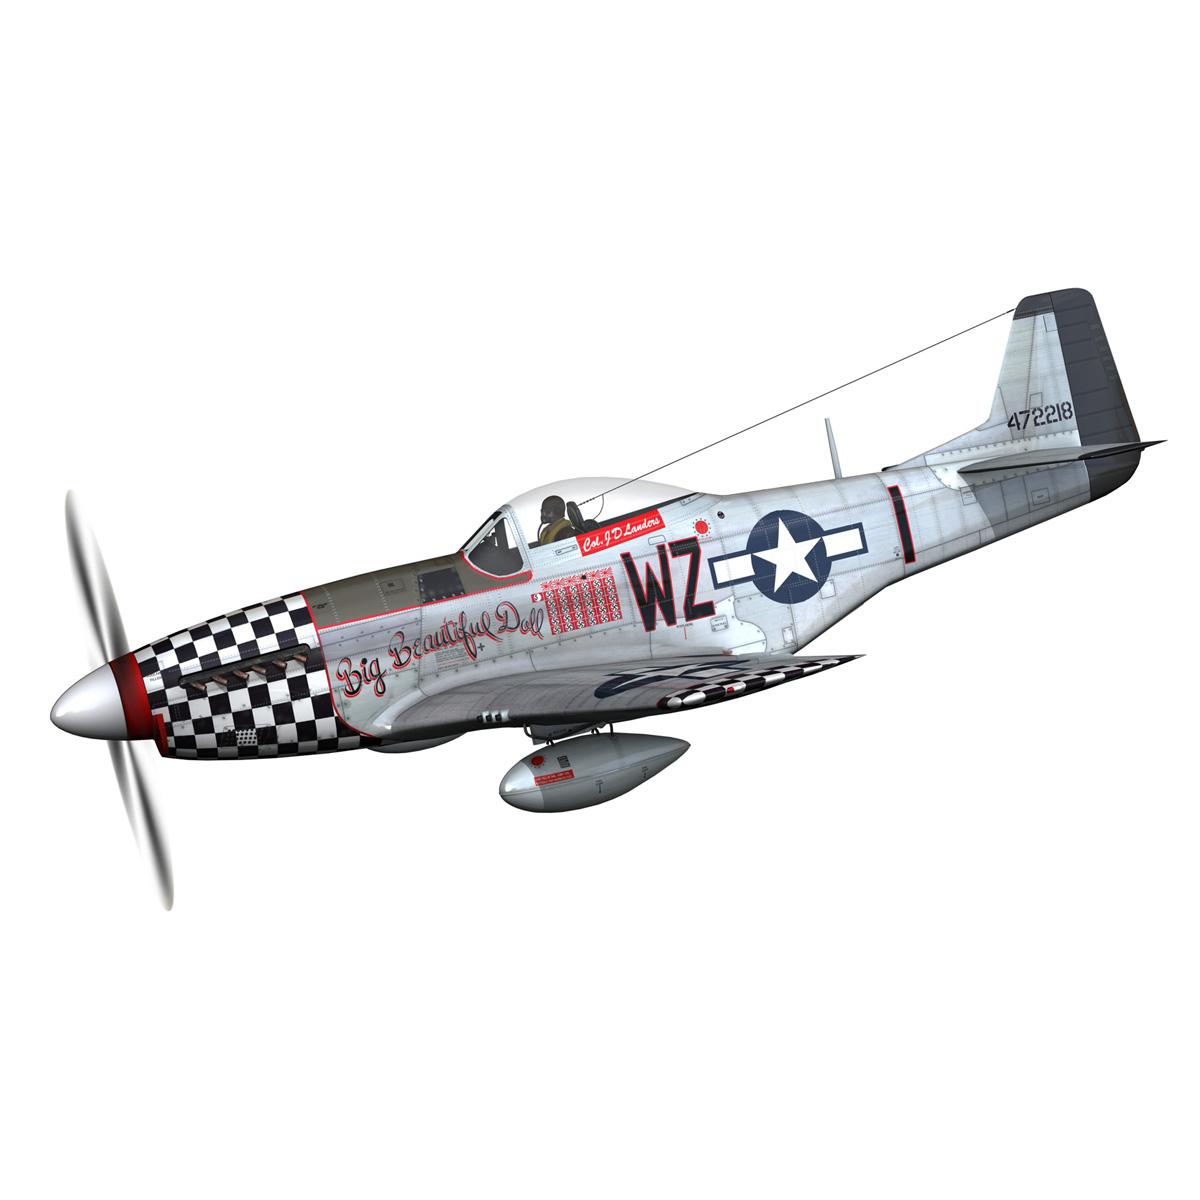 north american p-51d mustang – big beautiful doll 3d model fbx c4d lwo obj 282553